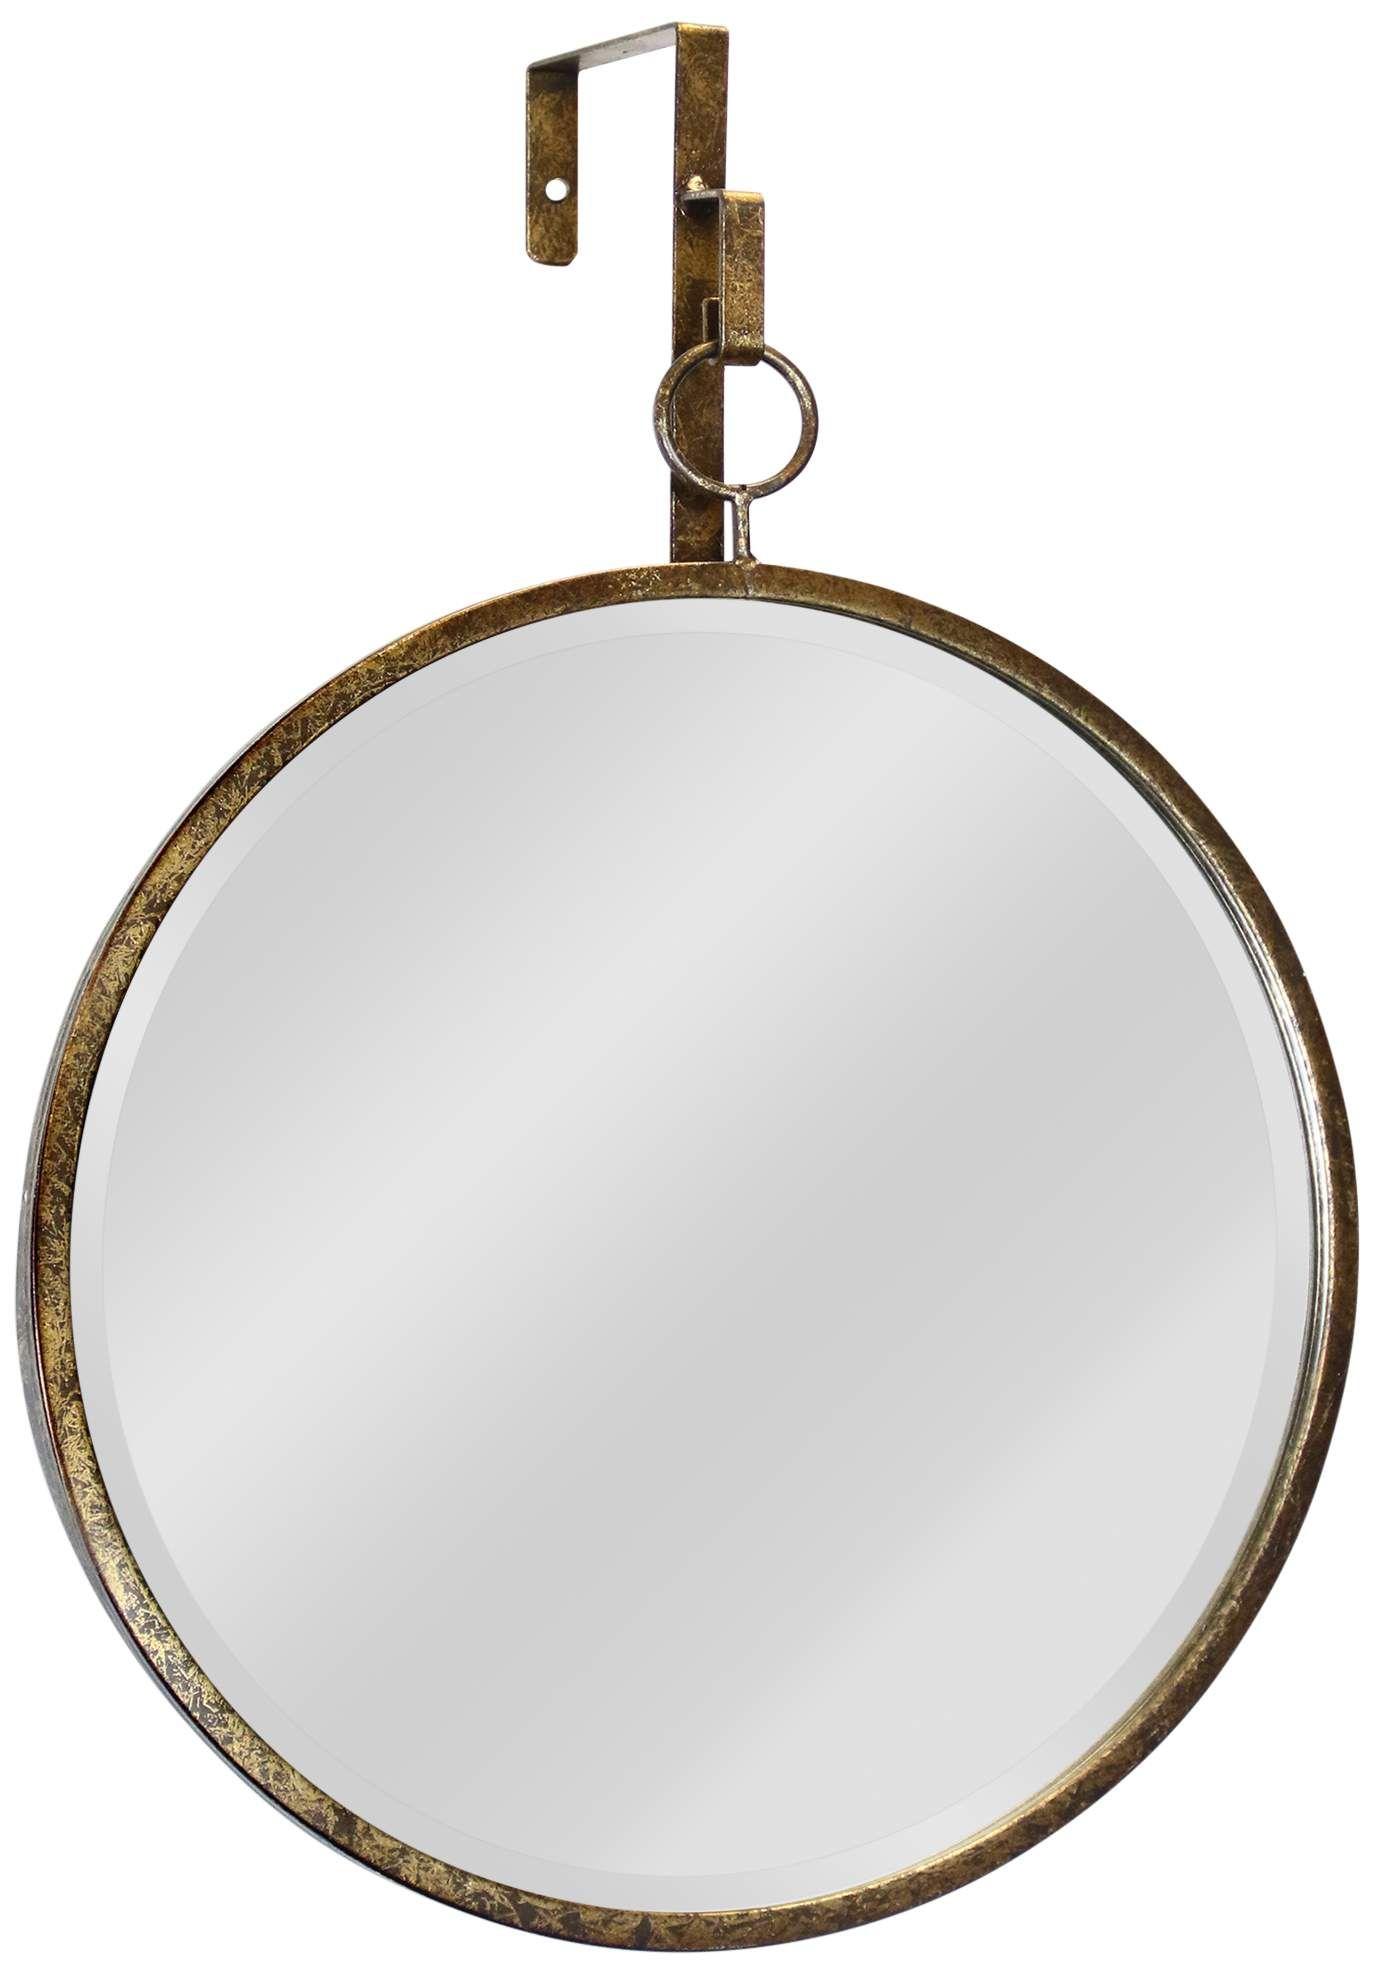 Mirrors Haile Antique Gold 17 1 4 X 20 Round Wall Mirror Round Wall Mirror Mirror Wall Mirror